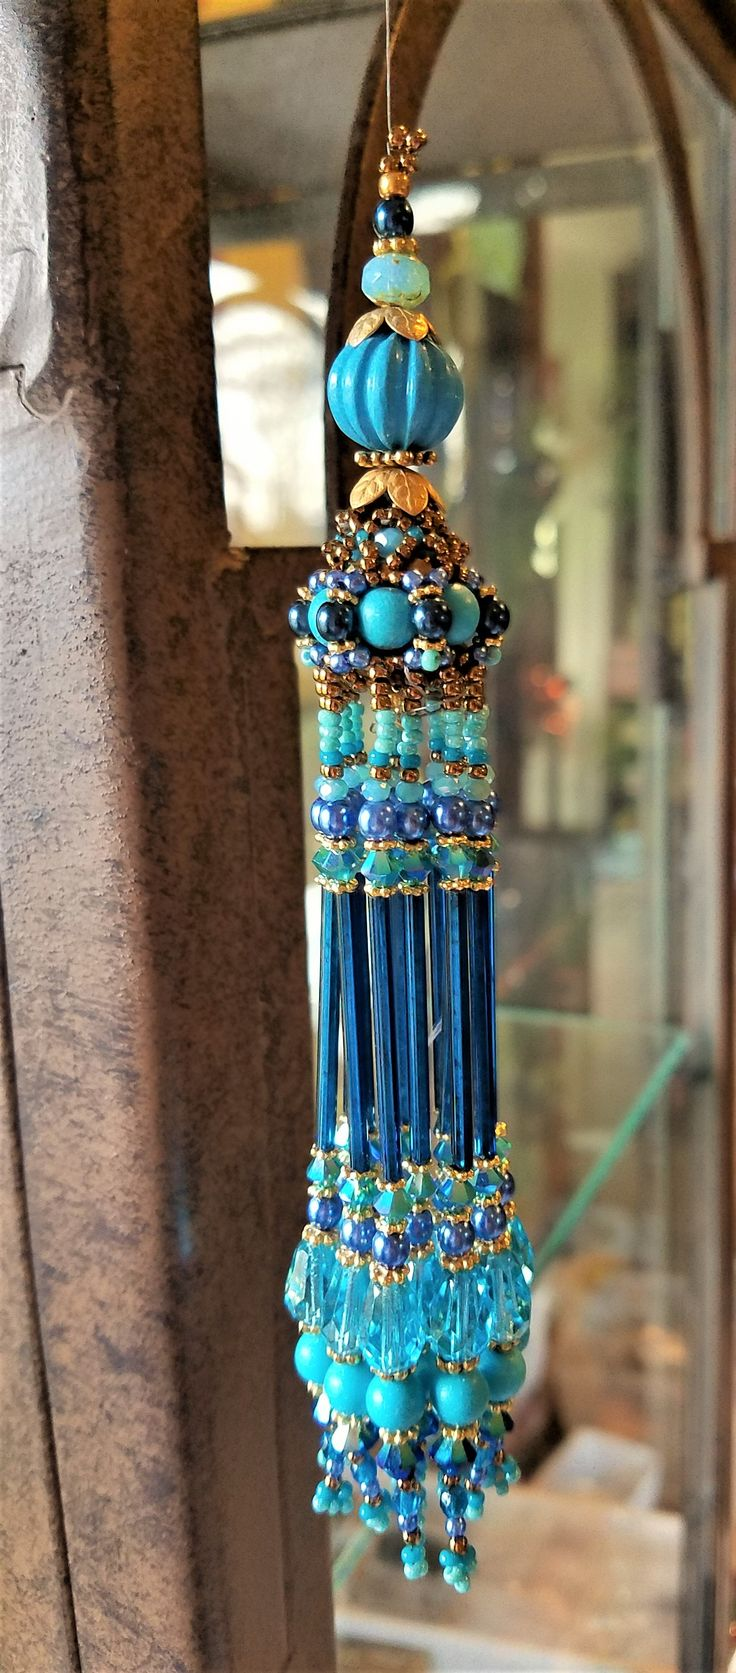 Kiowa Rose Beads-Beaded bead tassel for Turquoise necklace. Kiowarose.com or kiowarosebeads.etsy.com